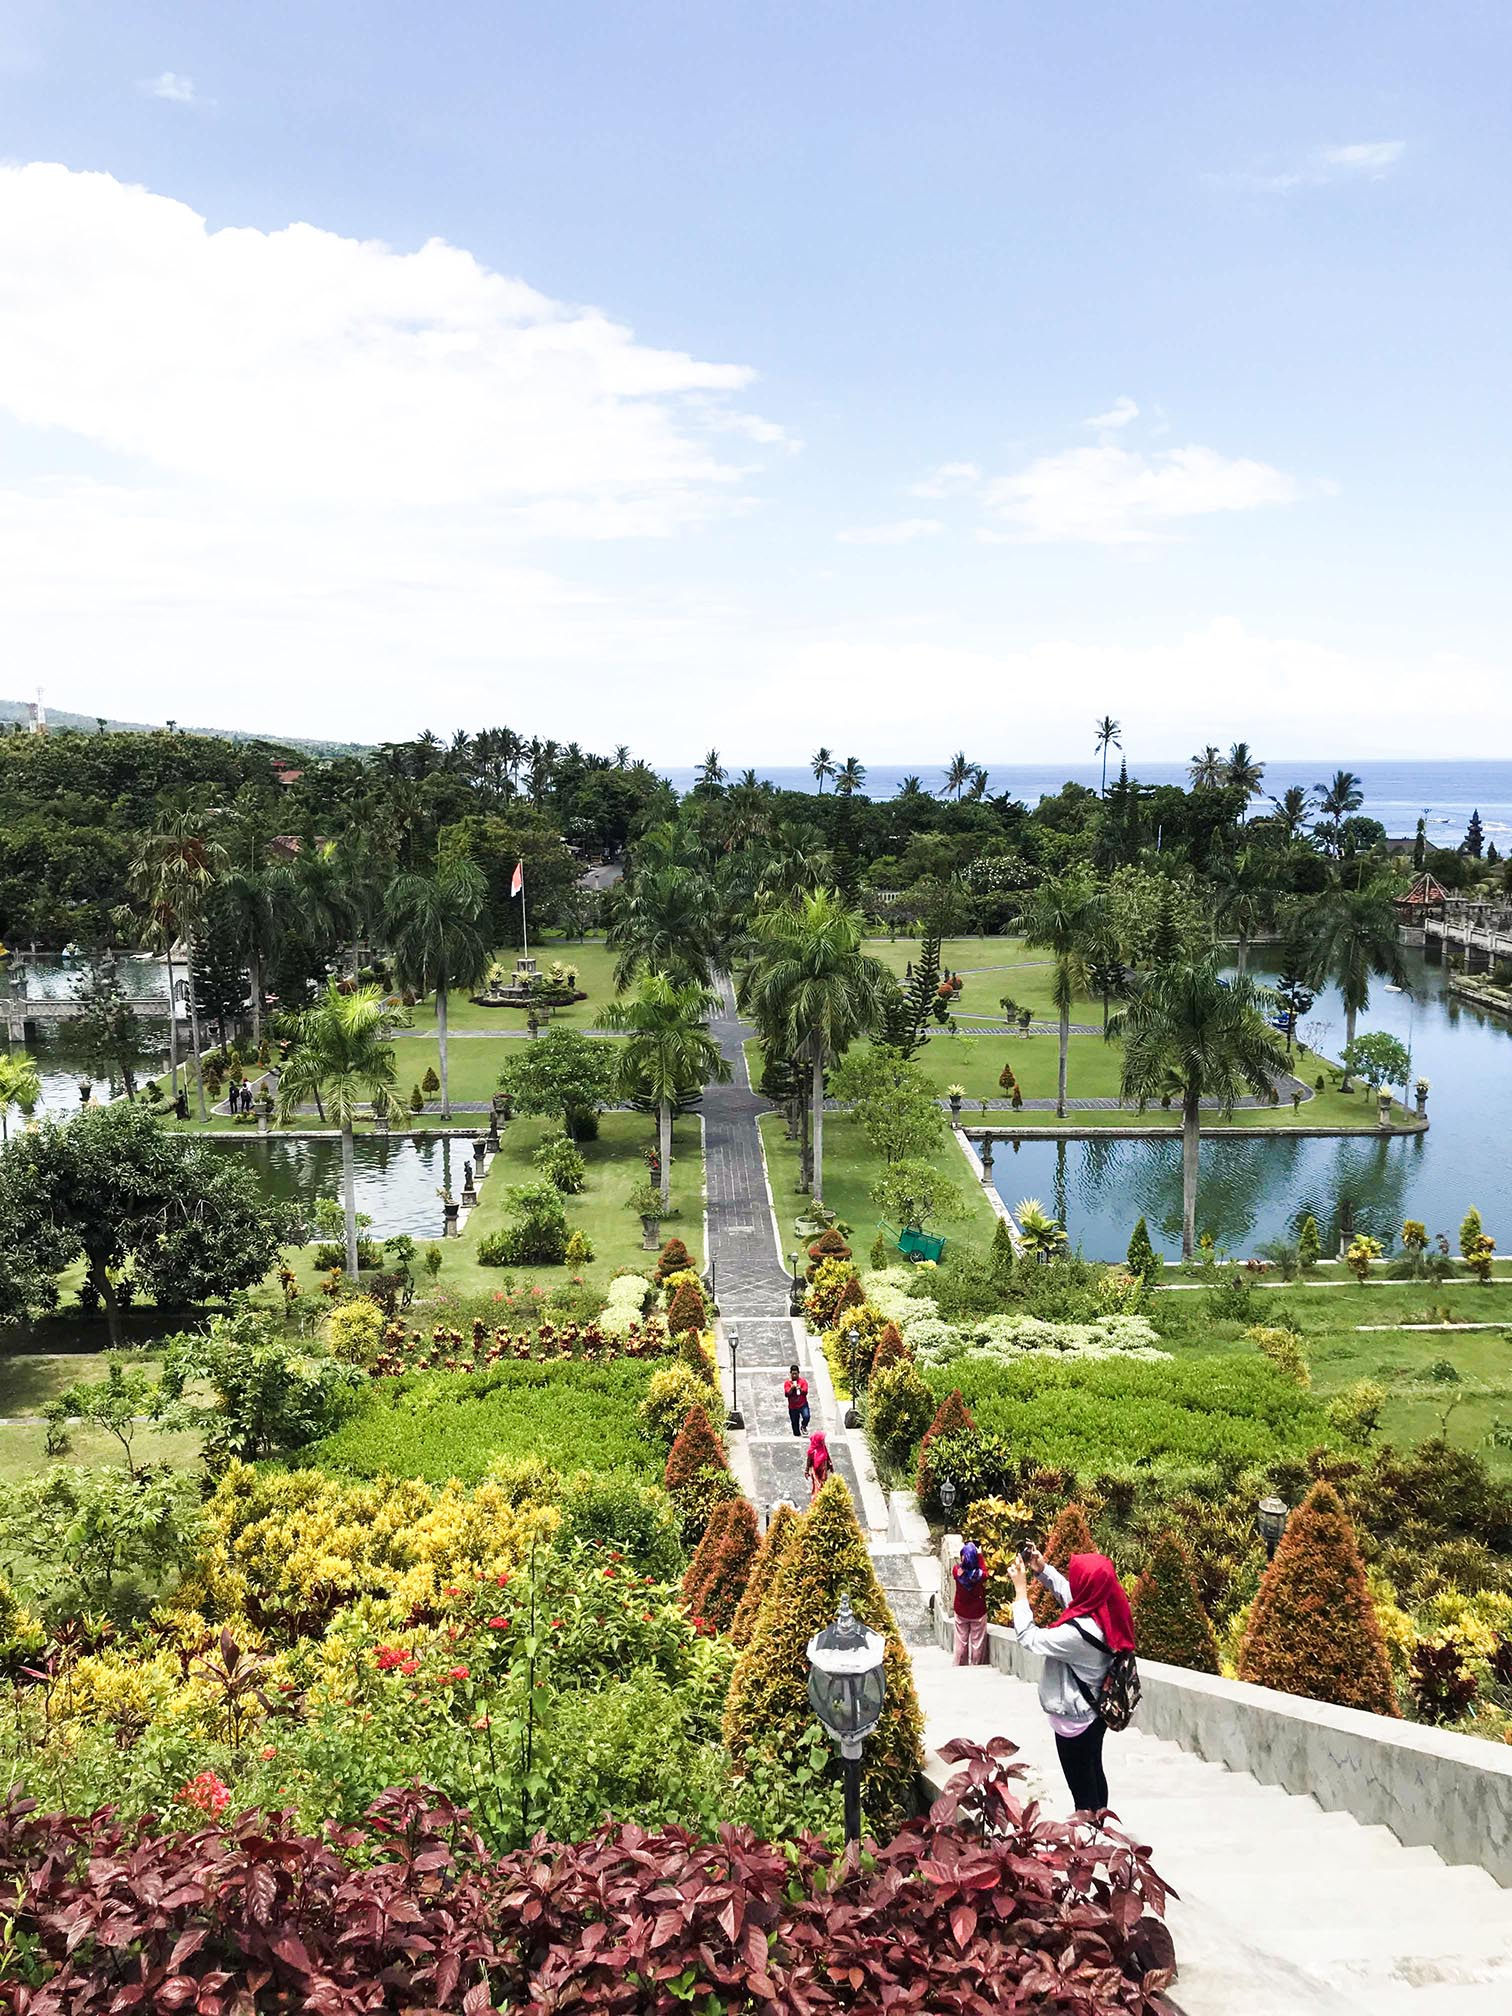 Ujung Water Palace in Bali